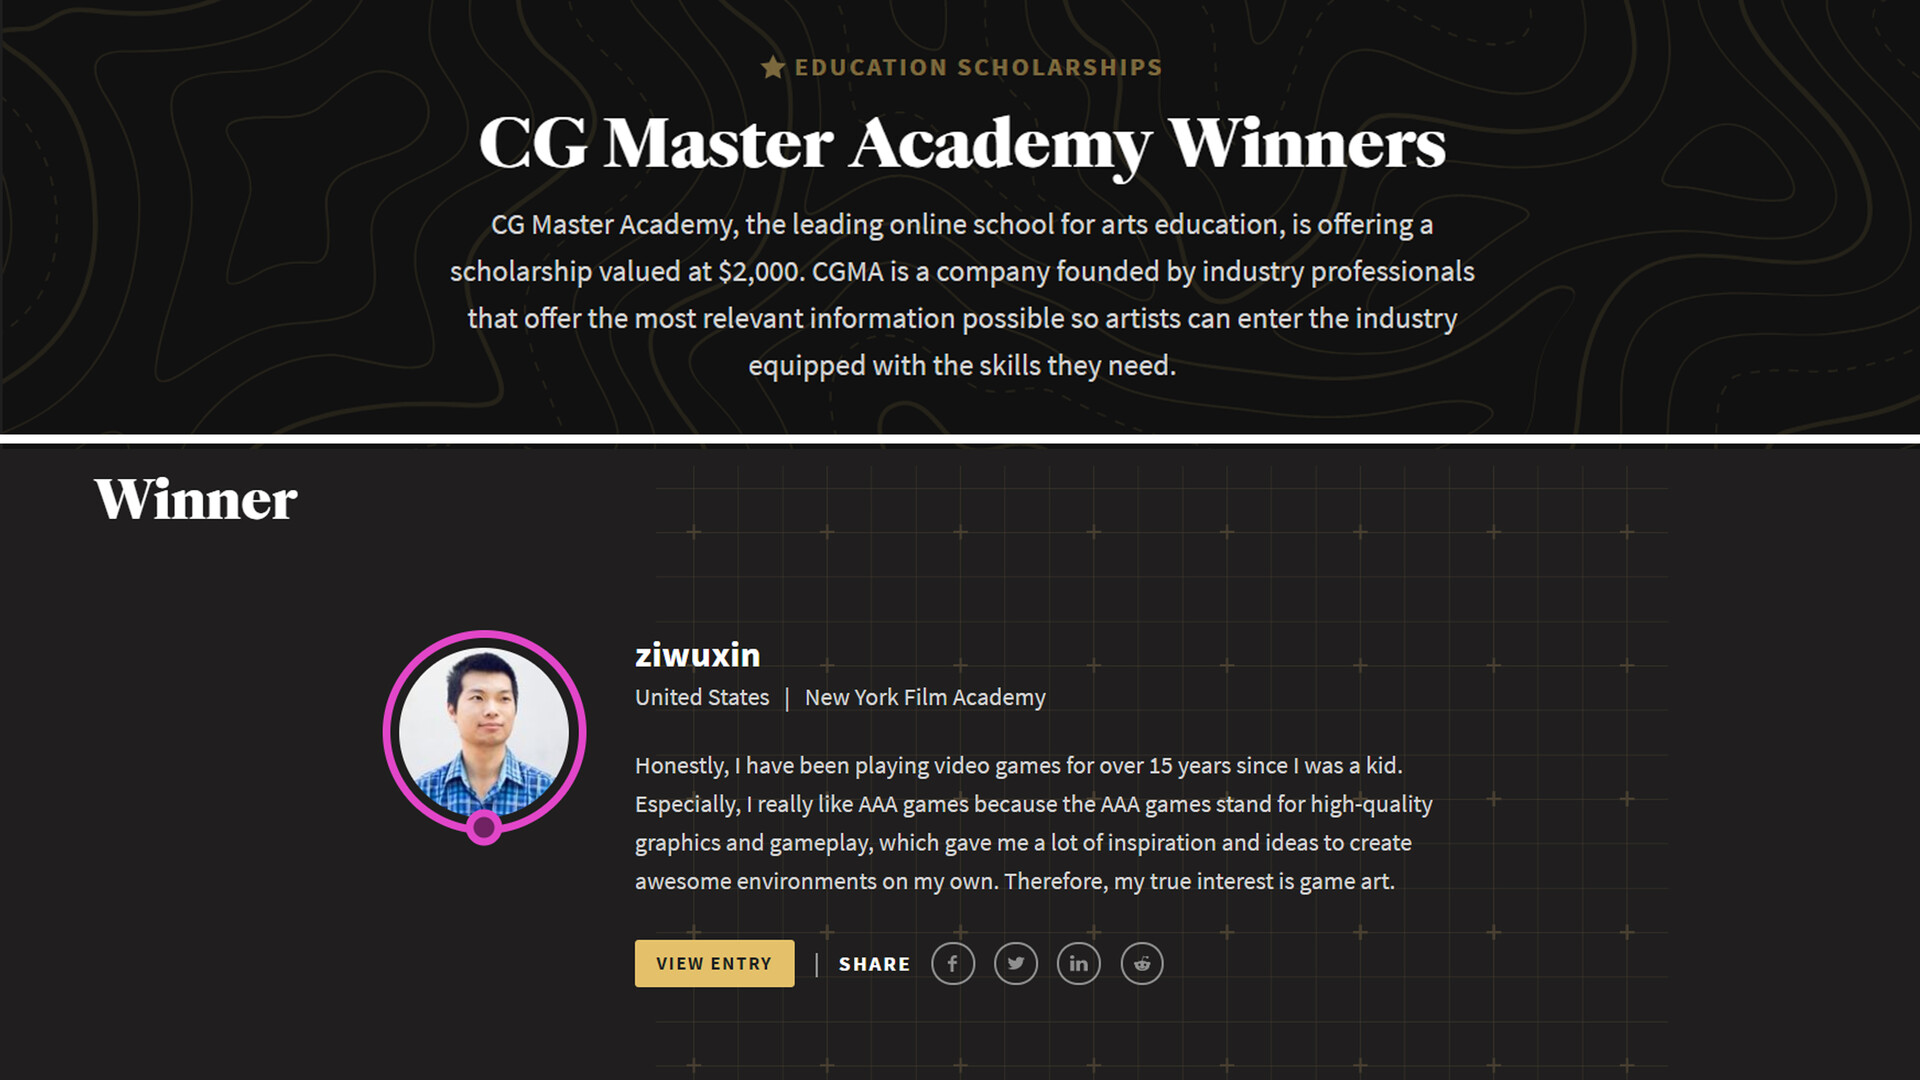 Junliang zhang cg master academy winners